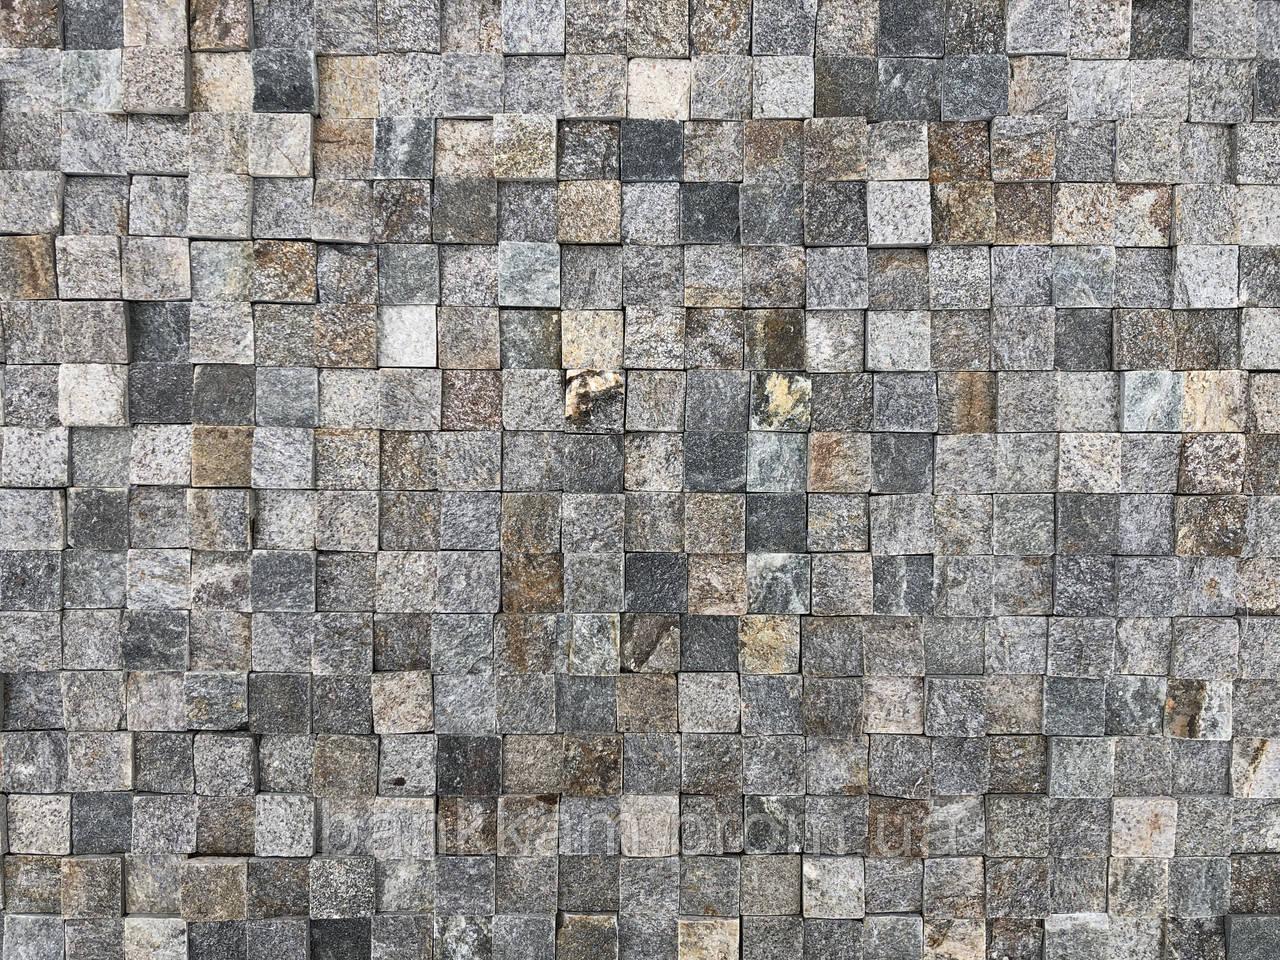 Мозаїка-панель Срібна Болгарія преміум (без шва для фуги; уп. 0,5 кв.м.)